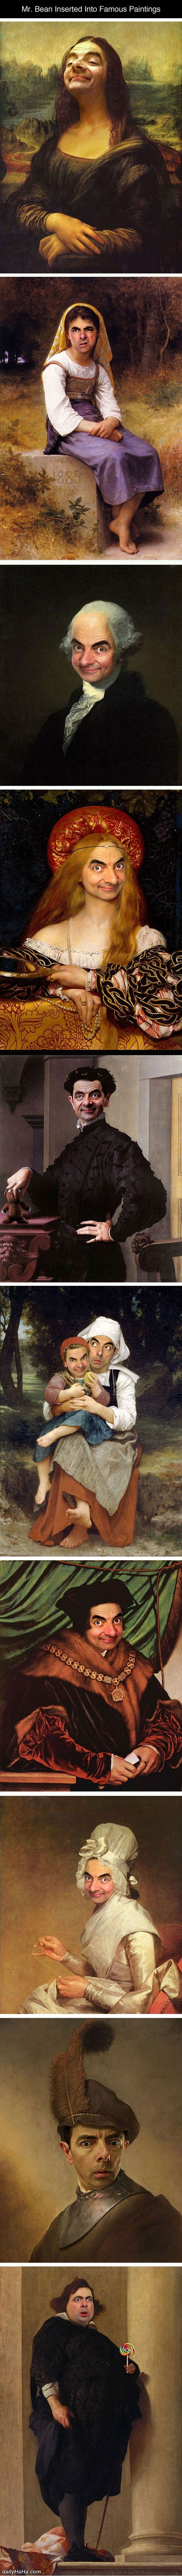 Mr Bean. source: dailyhaha. Mr. Bean Inserted Into Famous Paintings dailyhaha. com